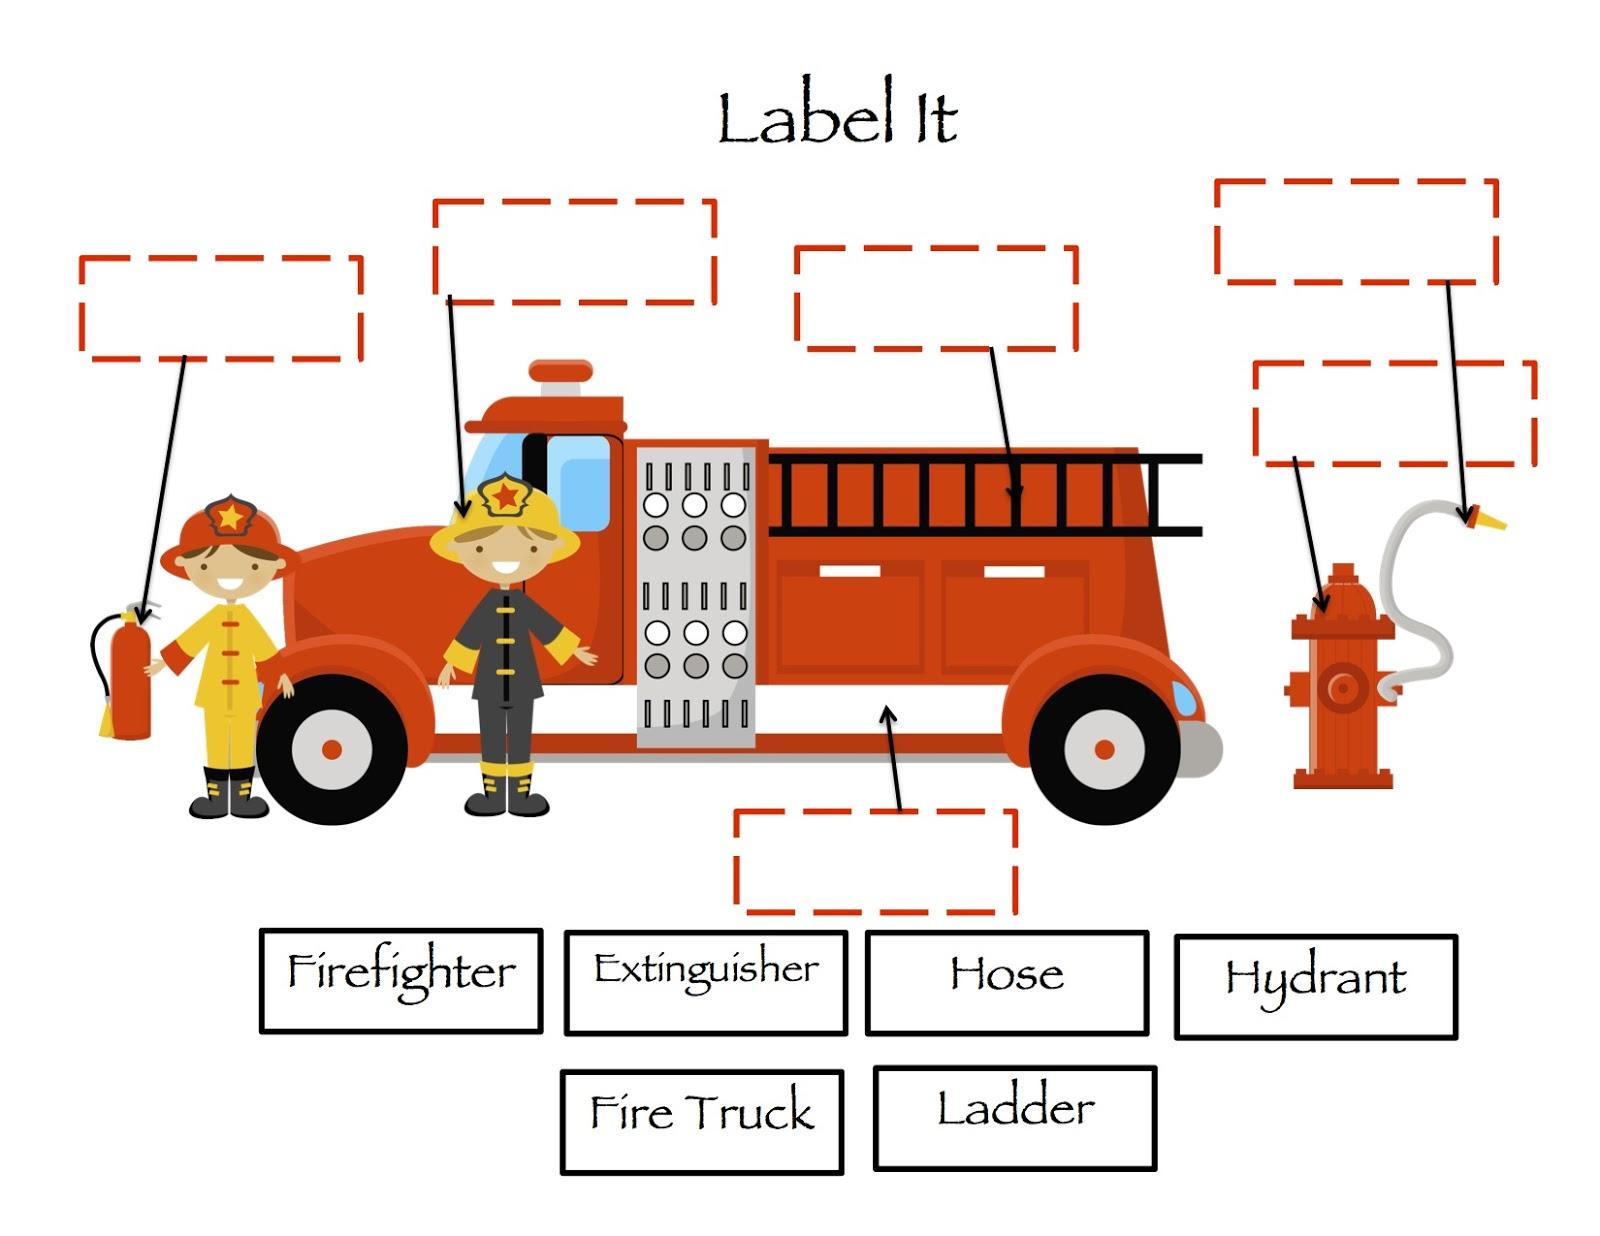 math worksheet : accessoris related : Firefighter Worksheets For Kindergarten